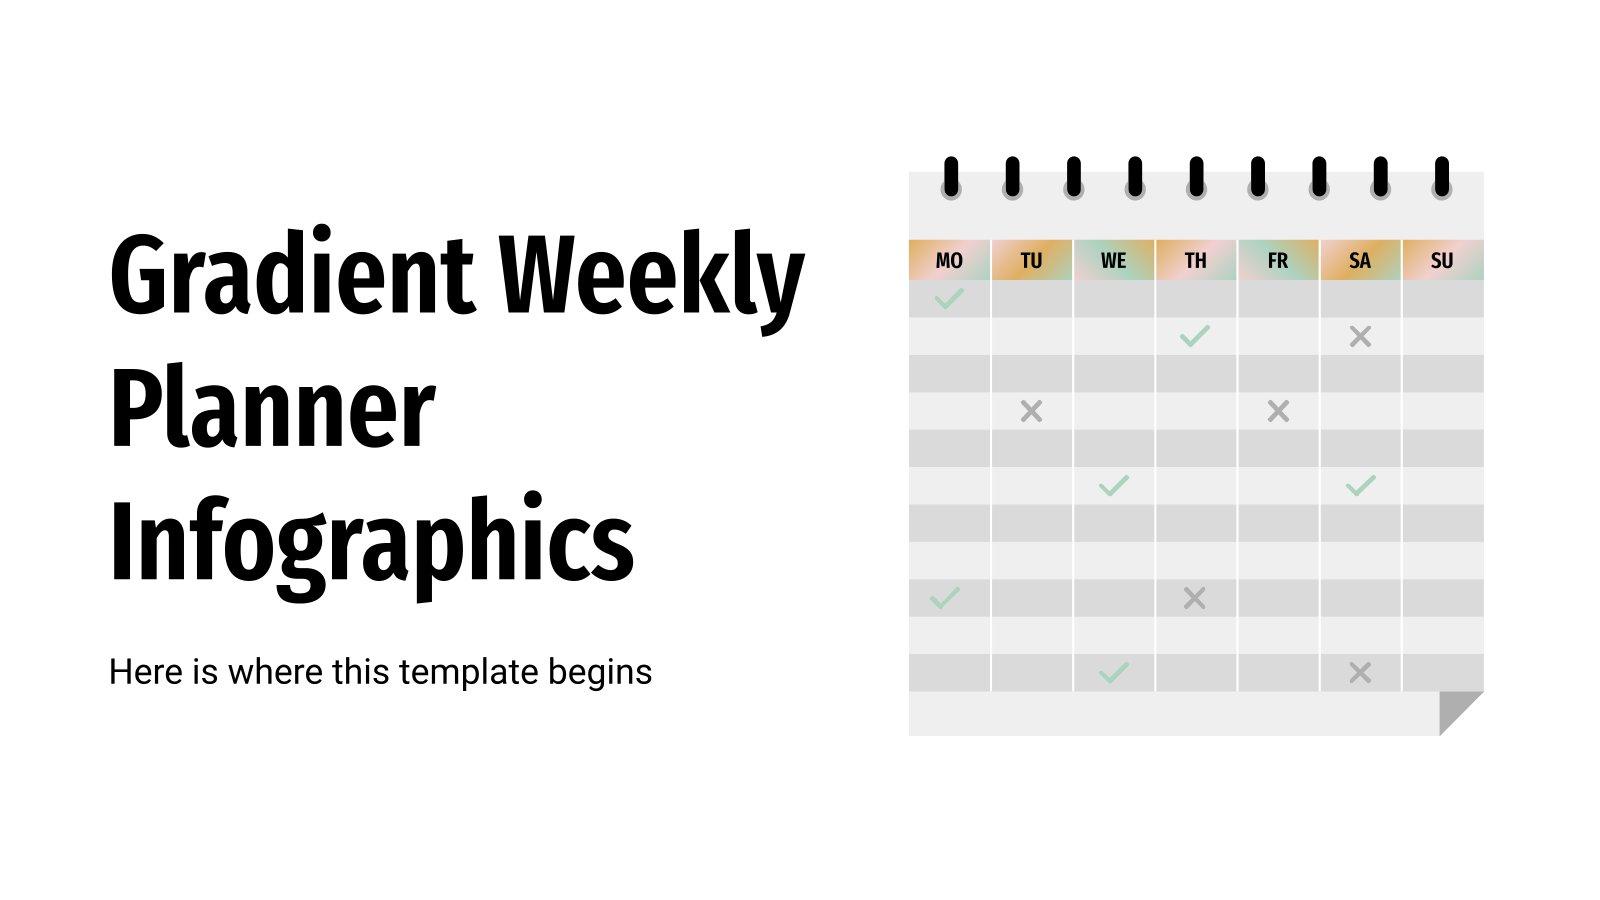 Gradient Weekly Planner Infographics presentation template